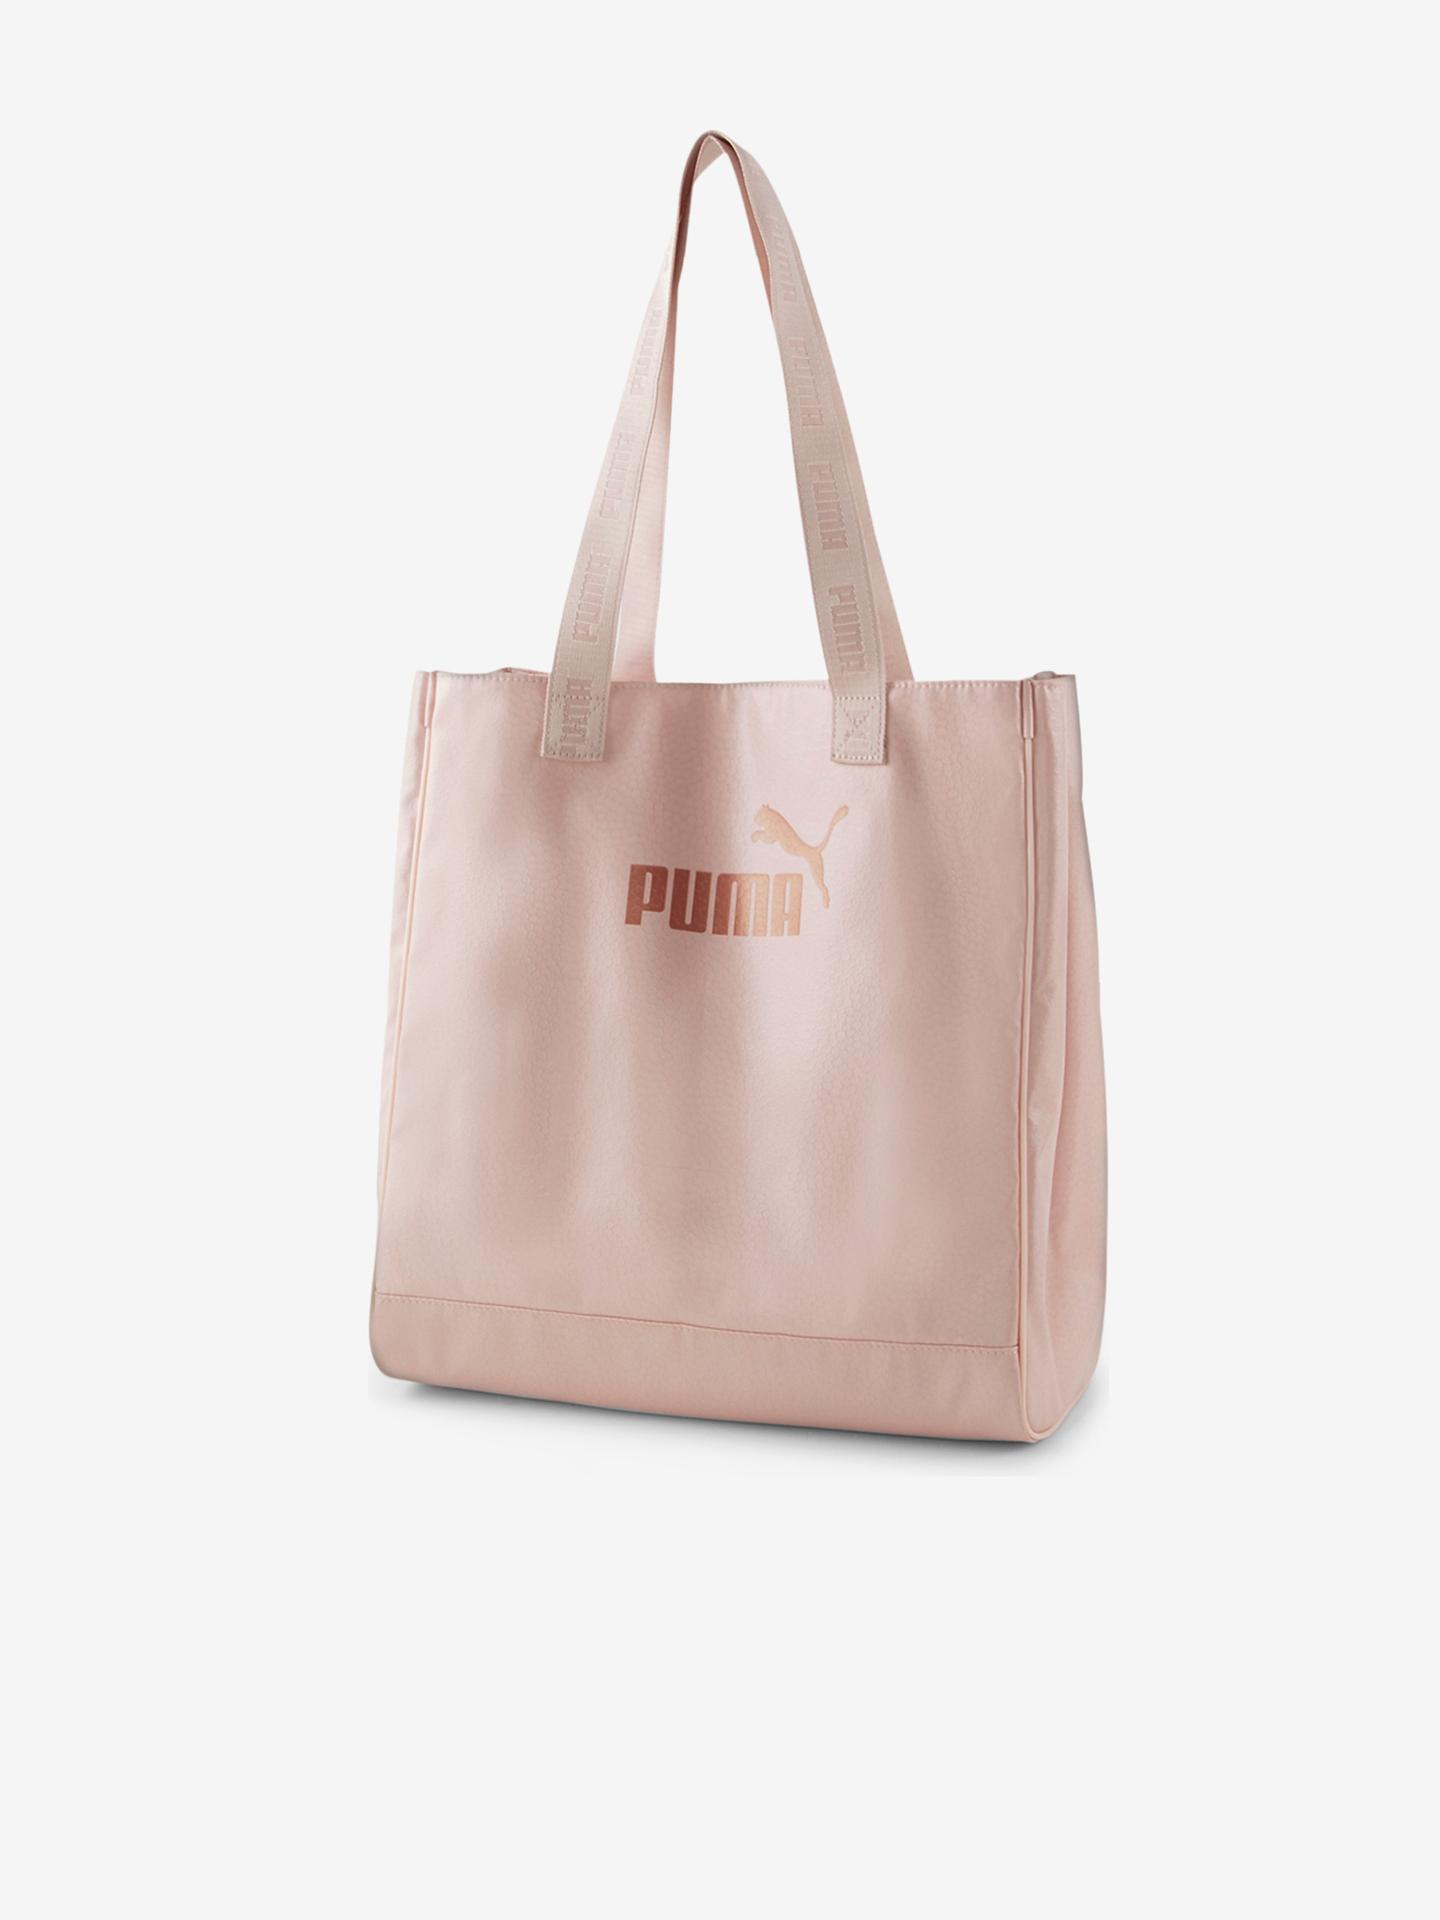 Puma Women's bag pink